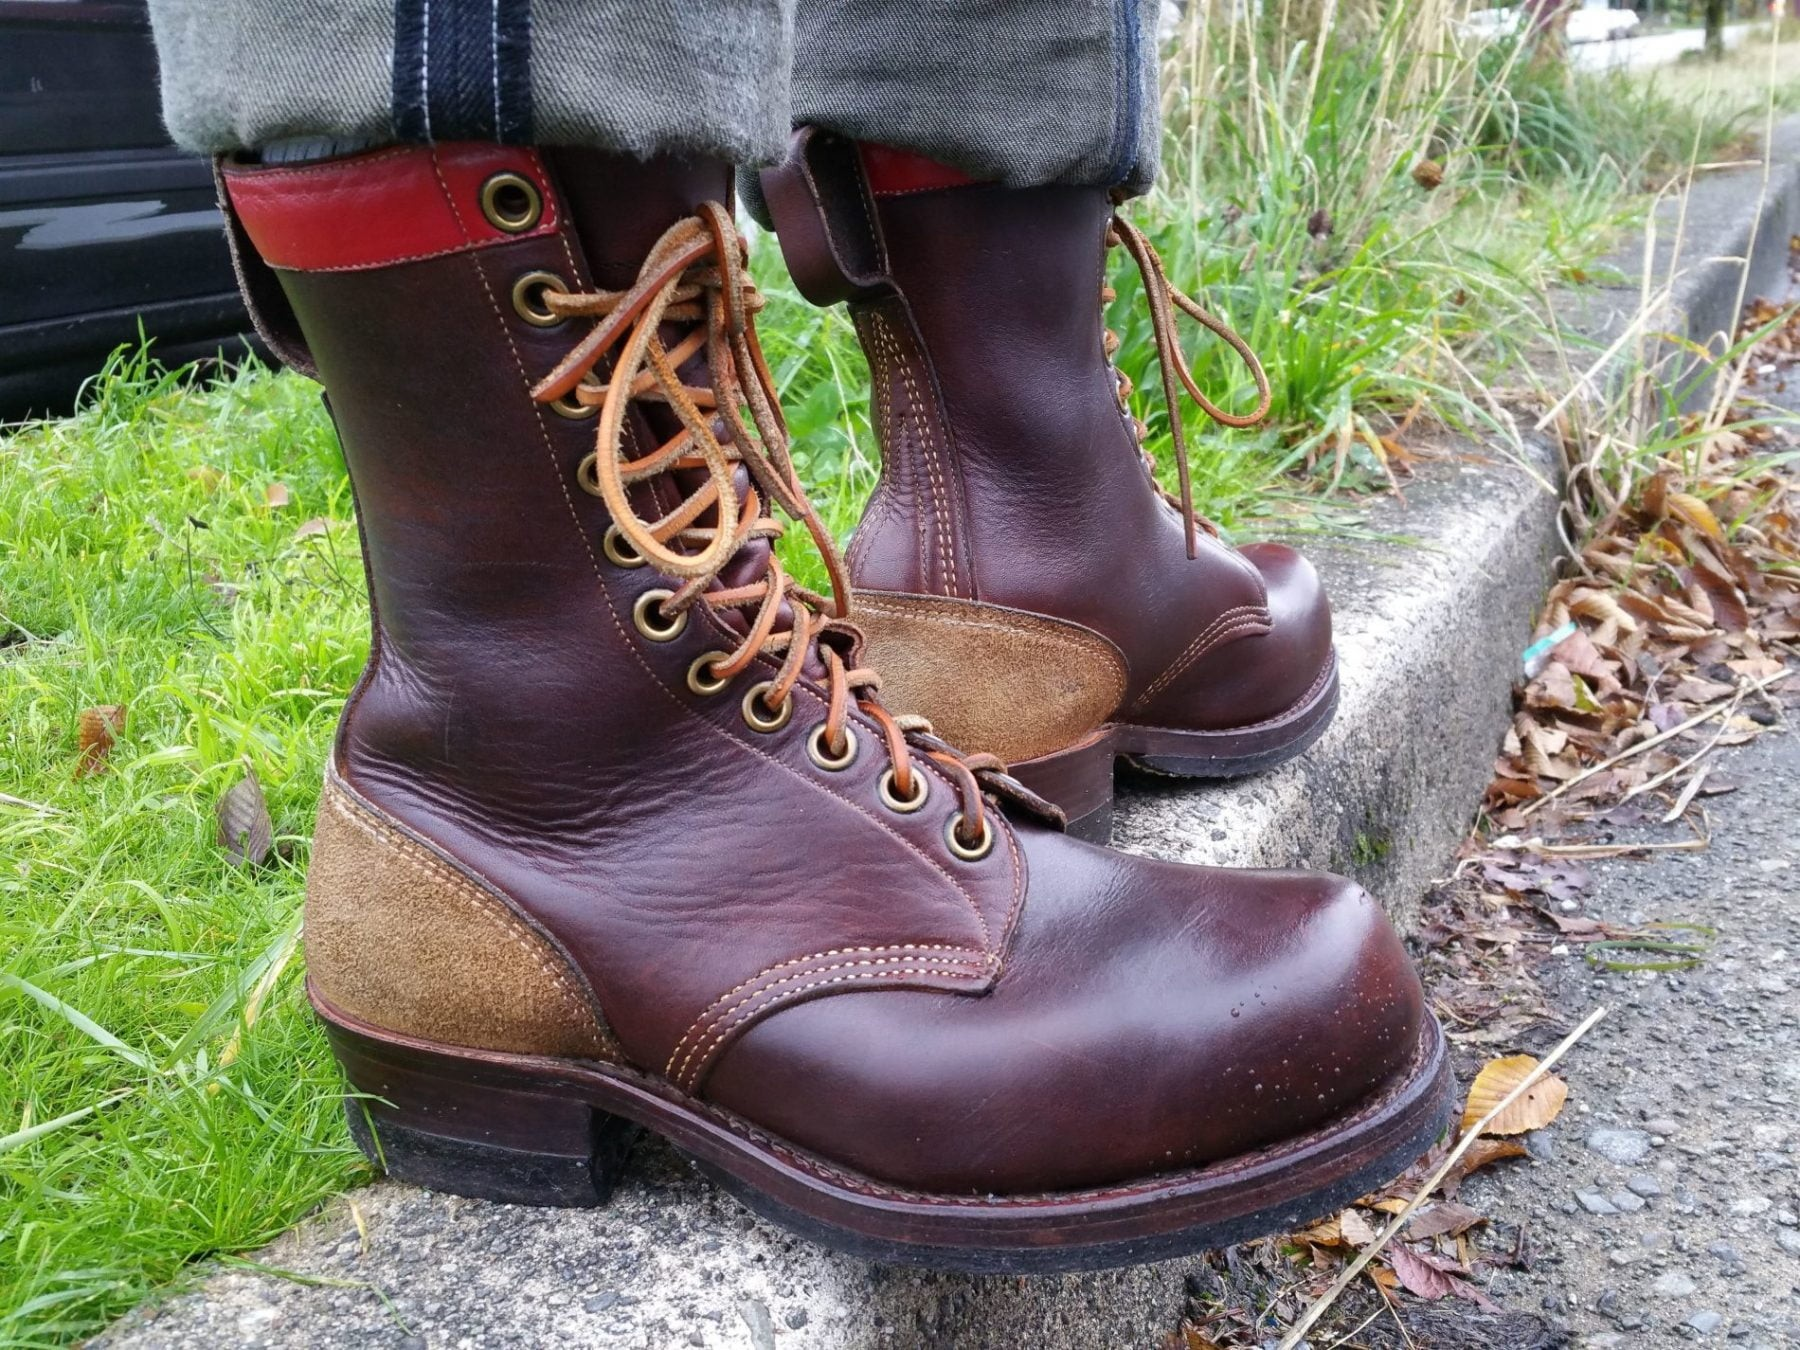 J. Leckie Skookum Logger boots